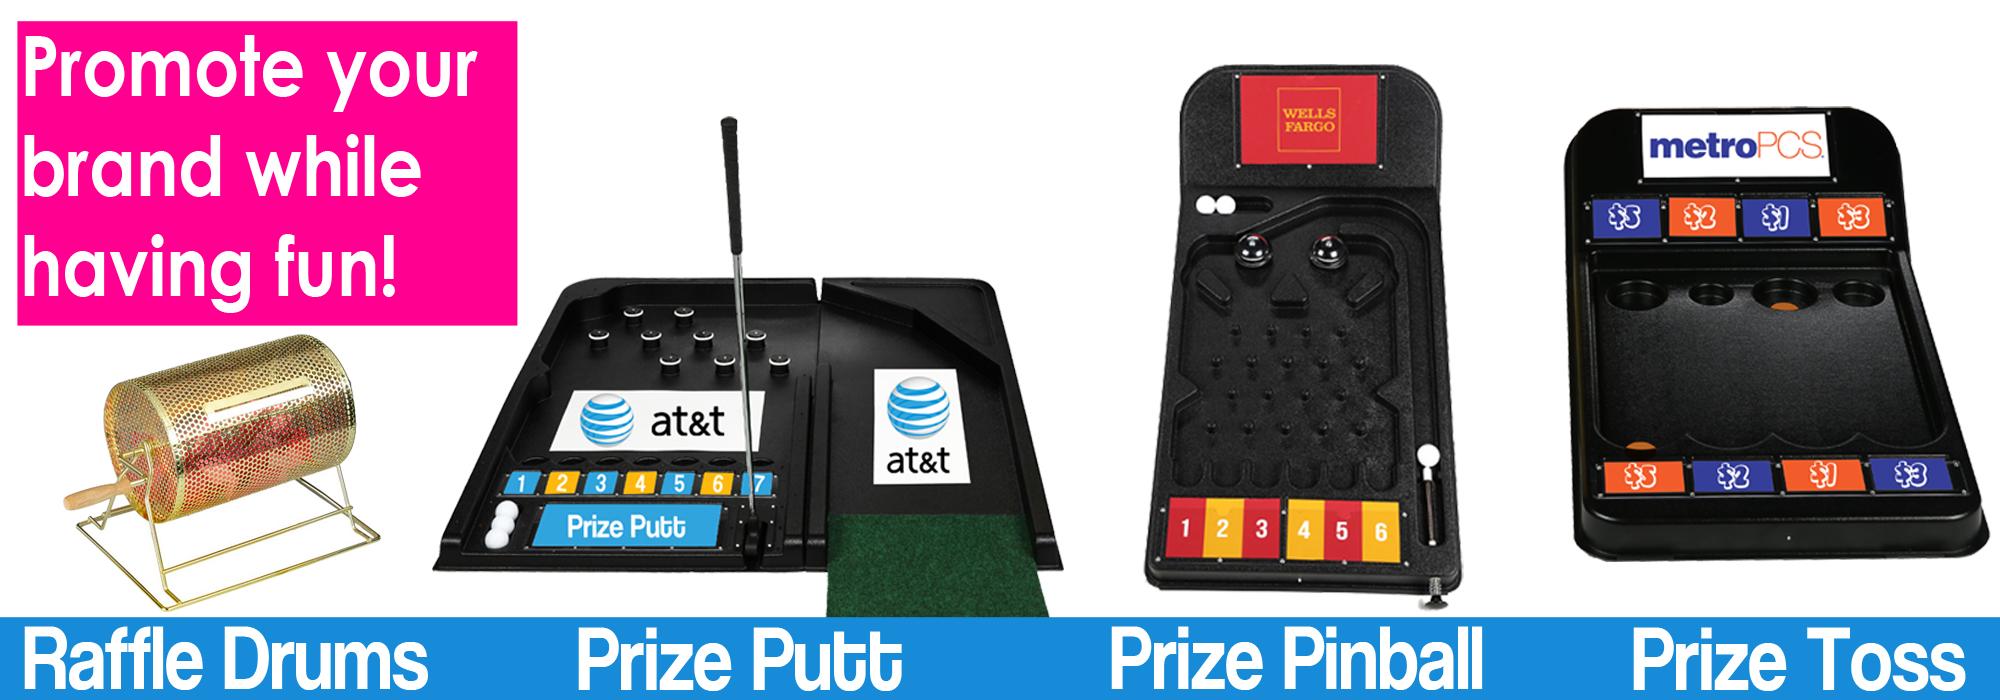 banner-prize-games.jpg